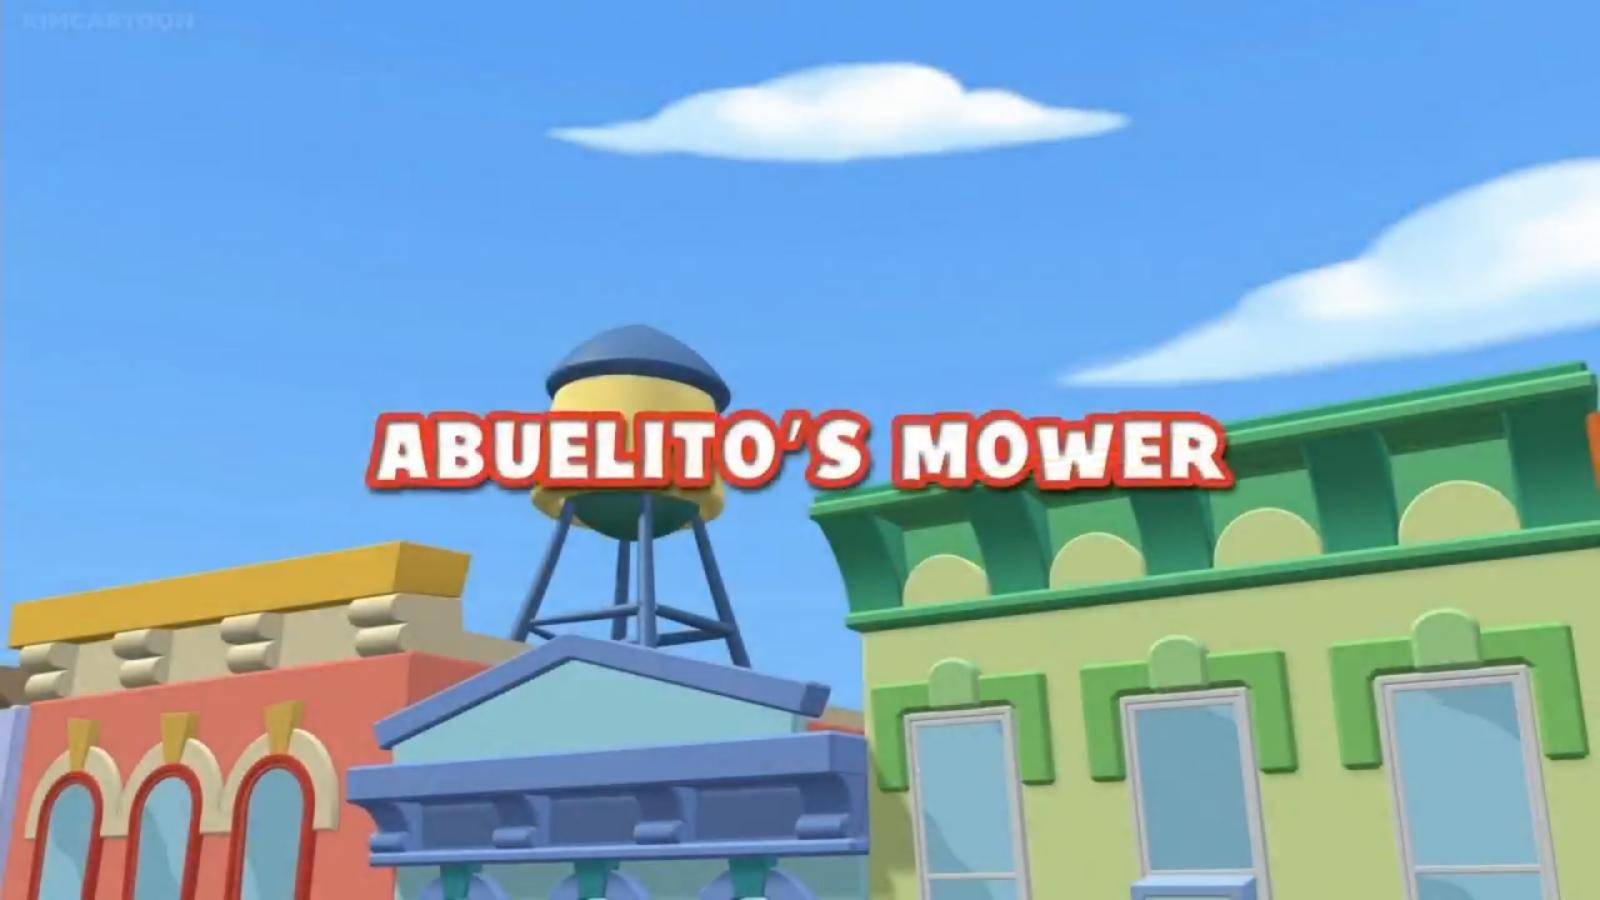 Abuelito's Mower